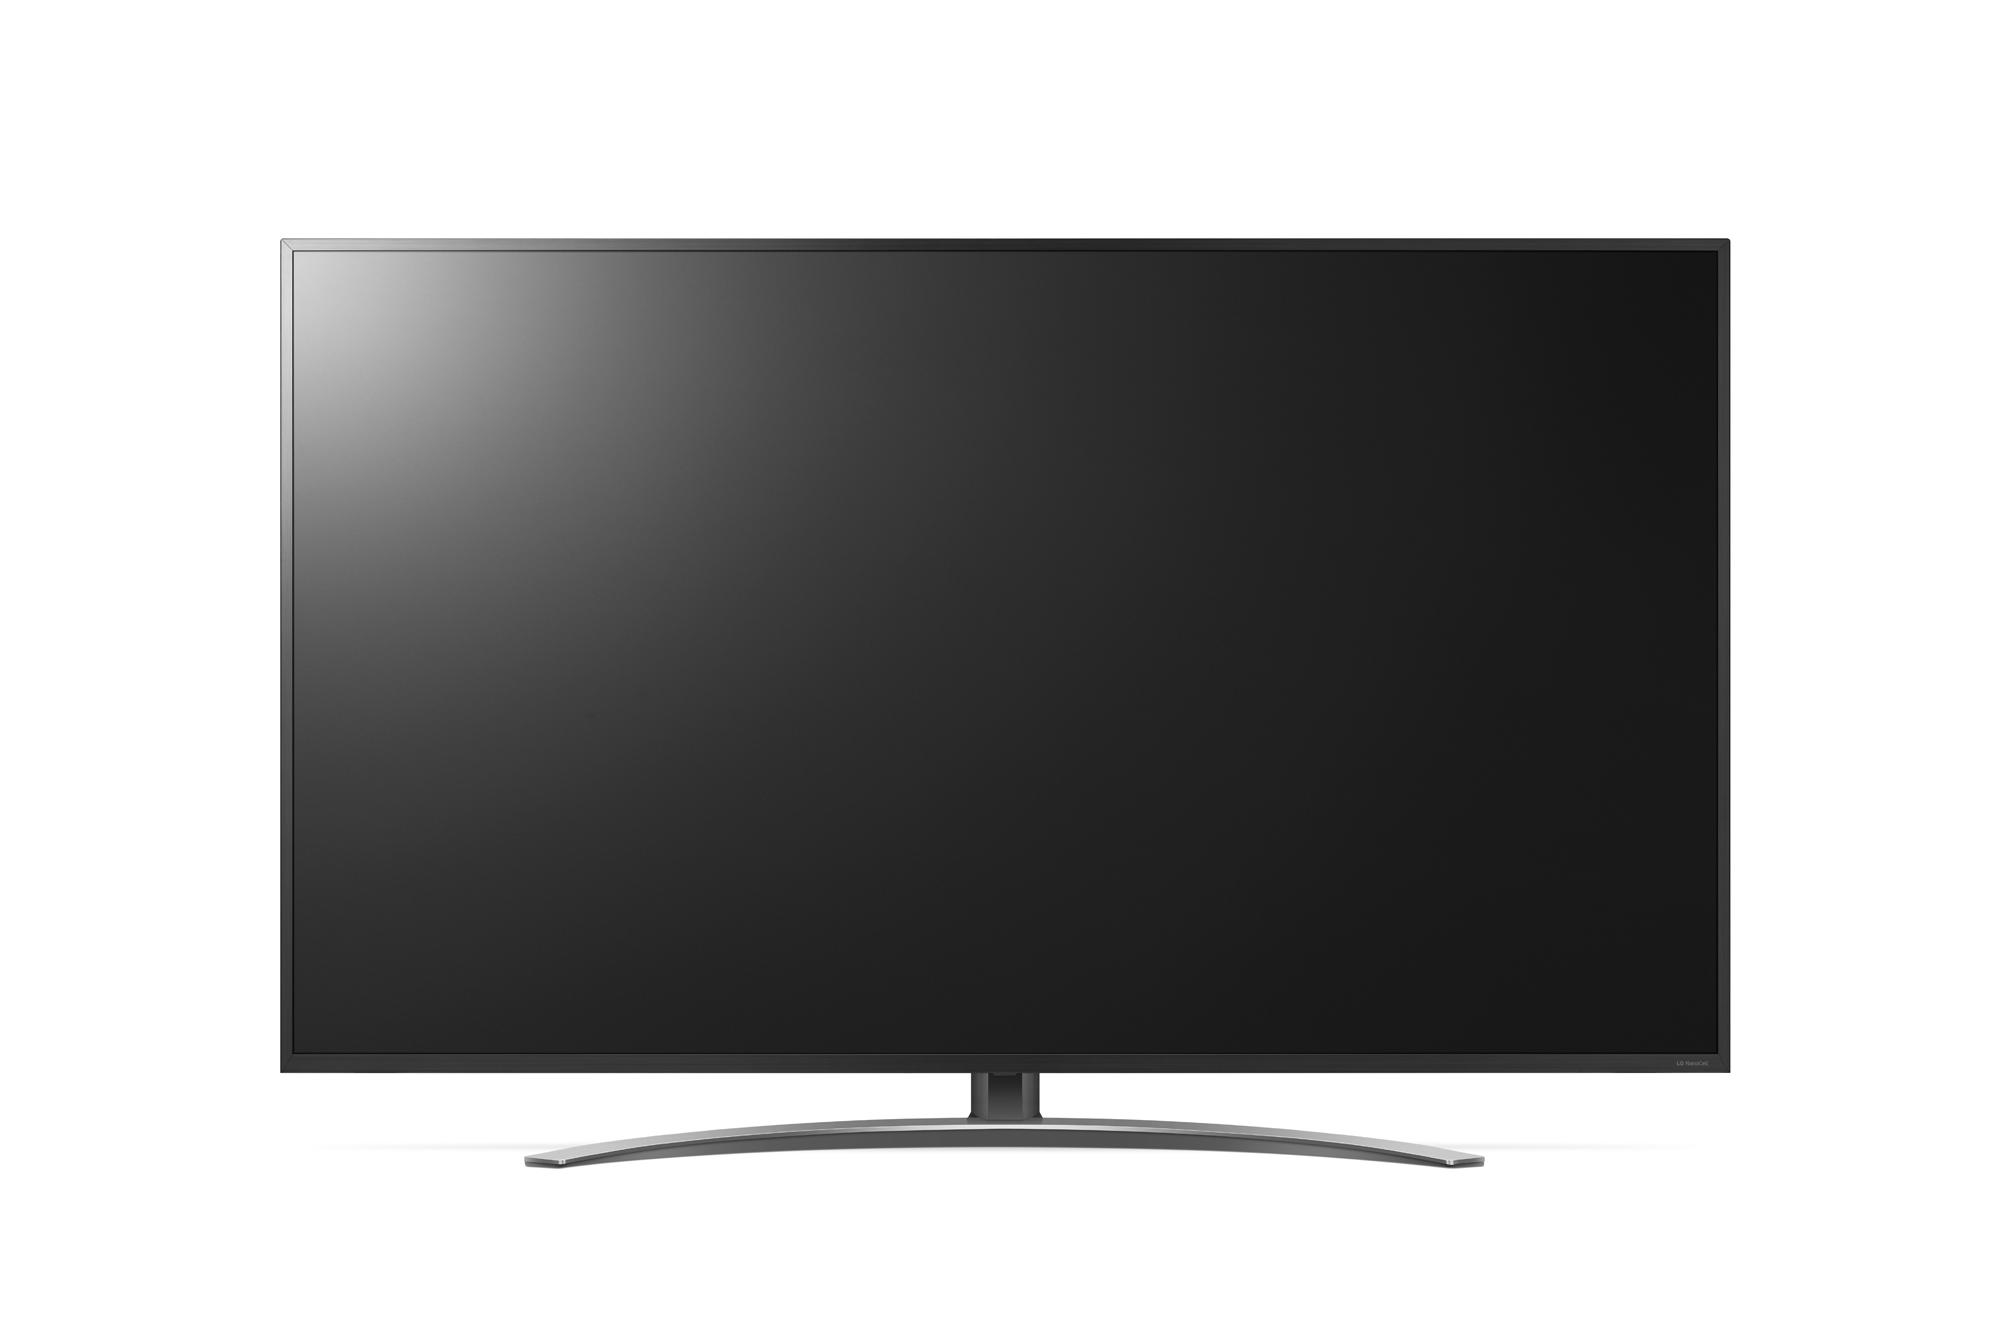 LG Pro:Centric SMART 75UT770H (NA) 2